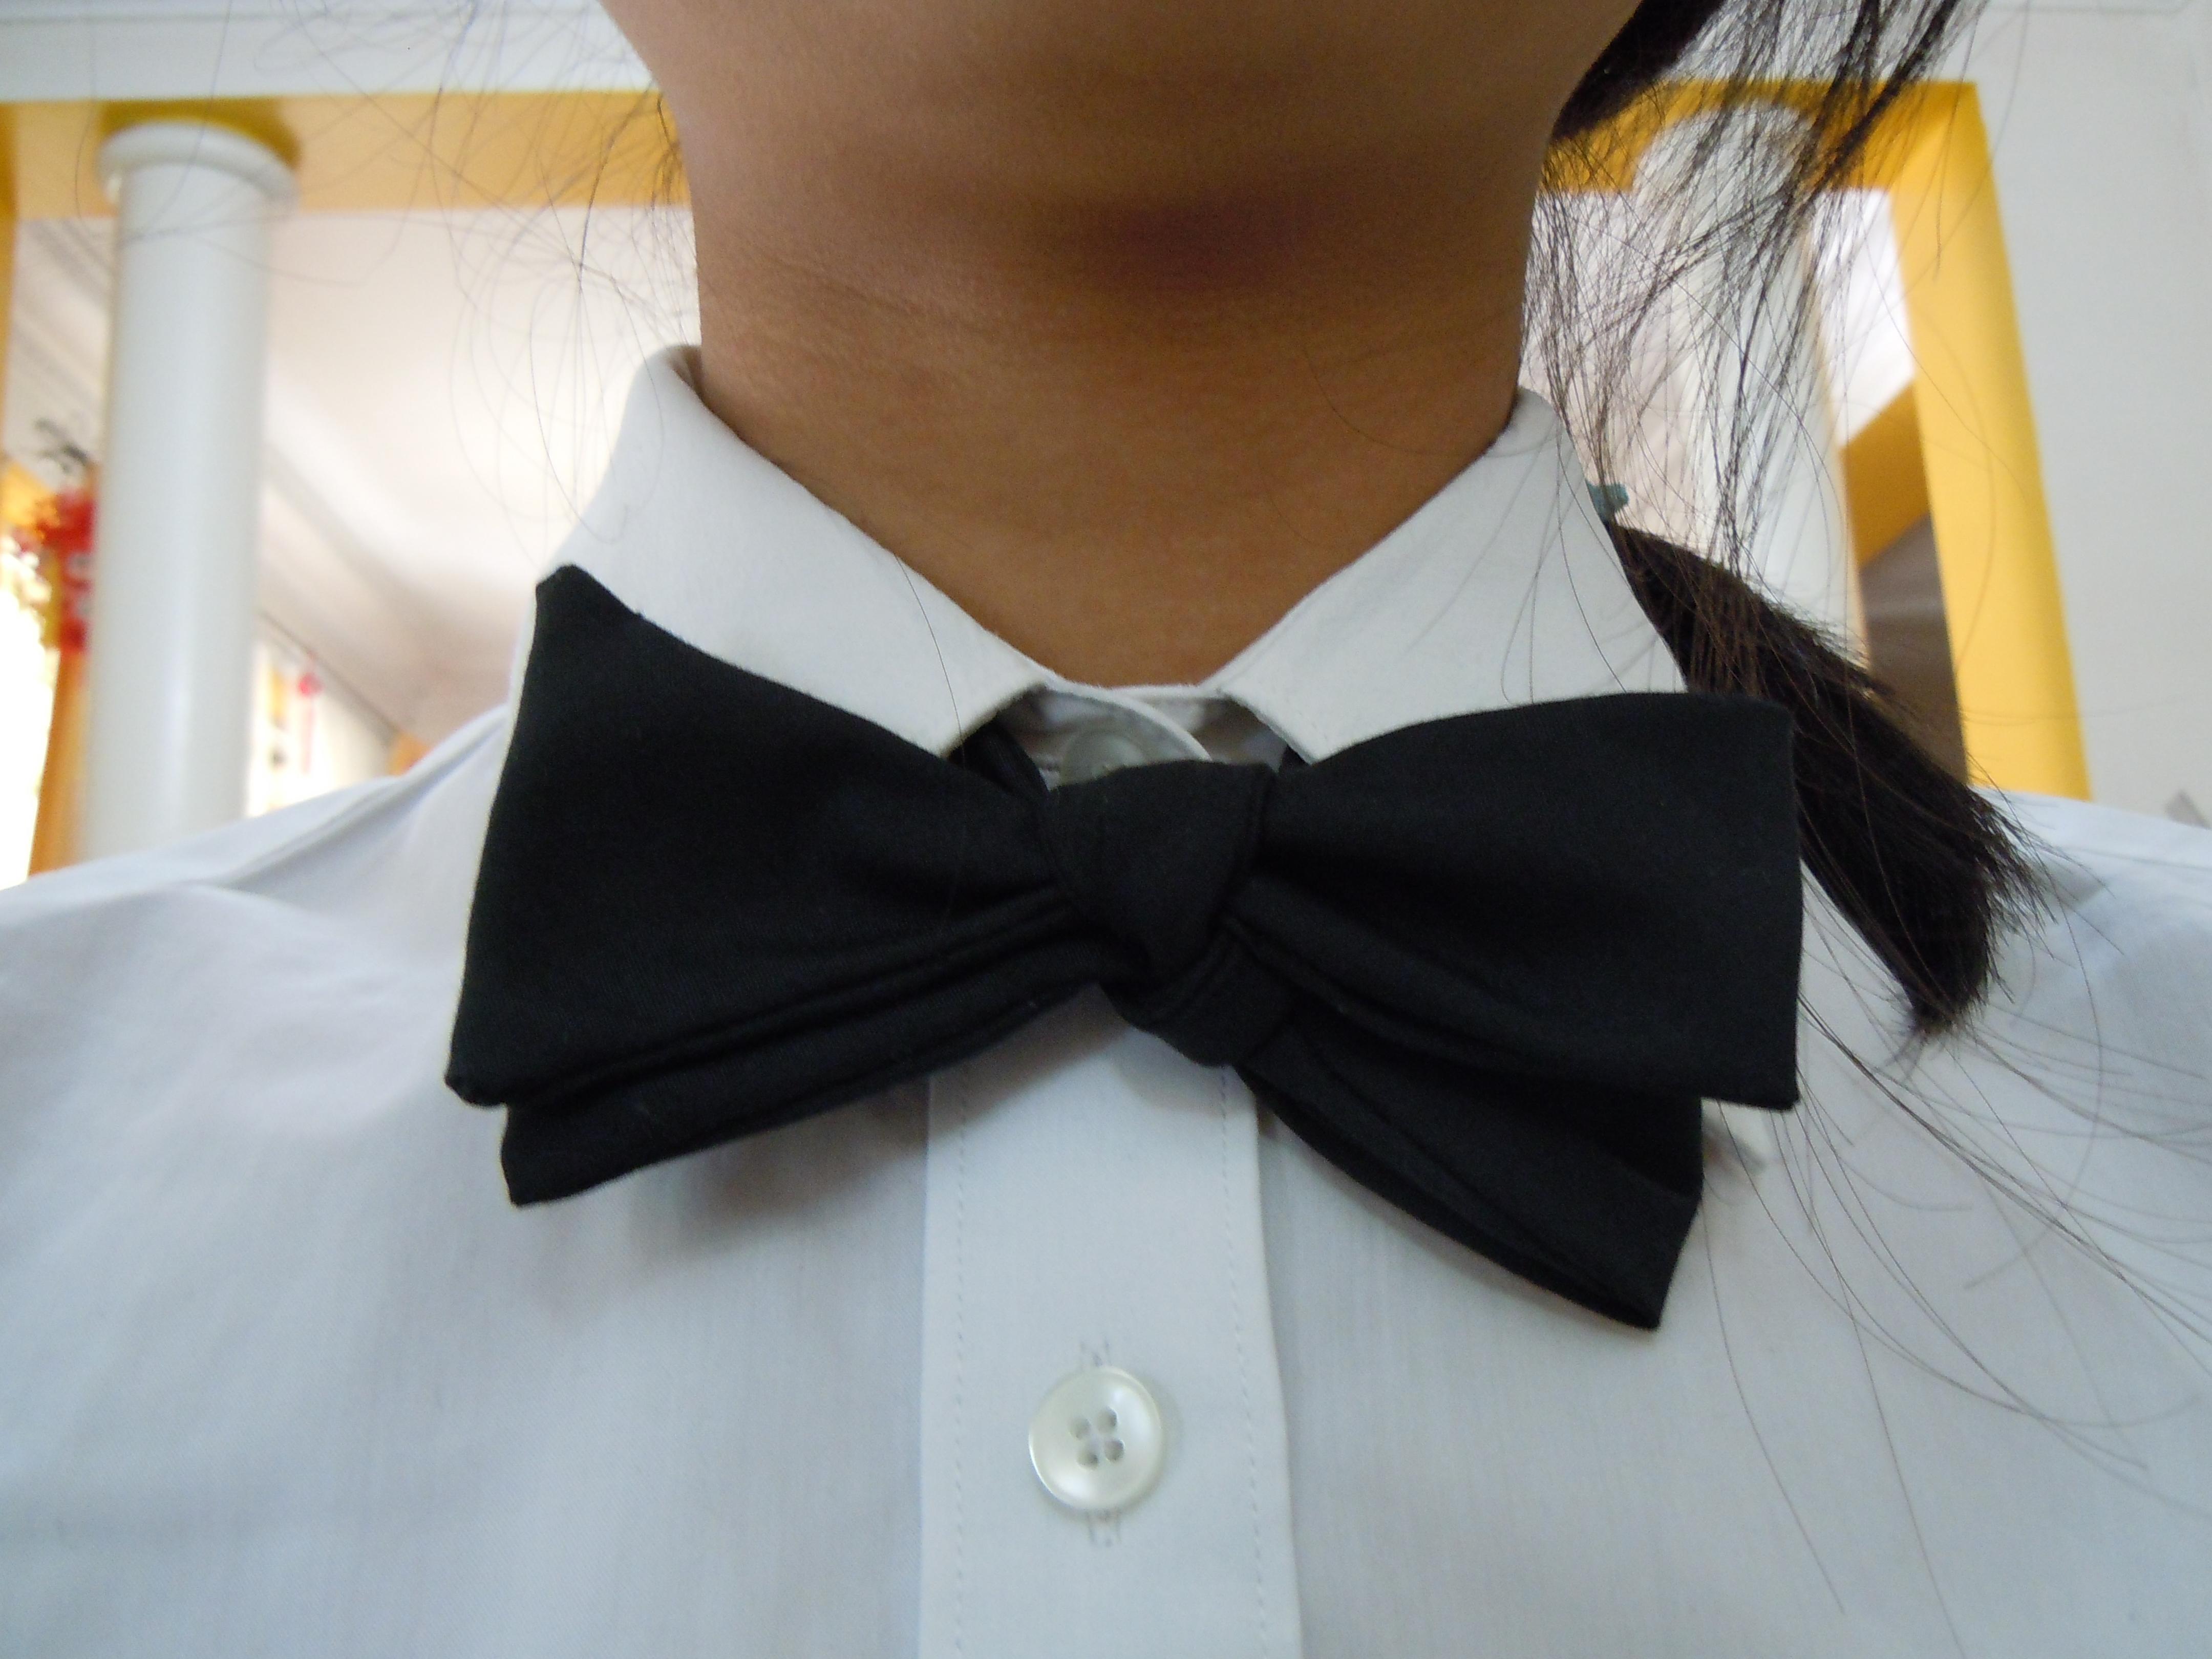 Make a Self-tie Bow-tie